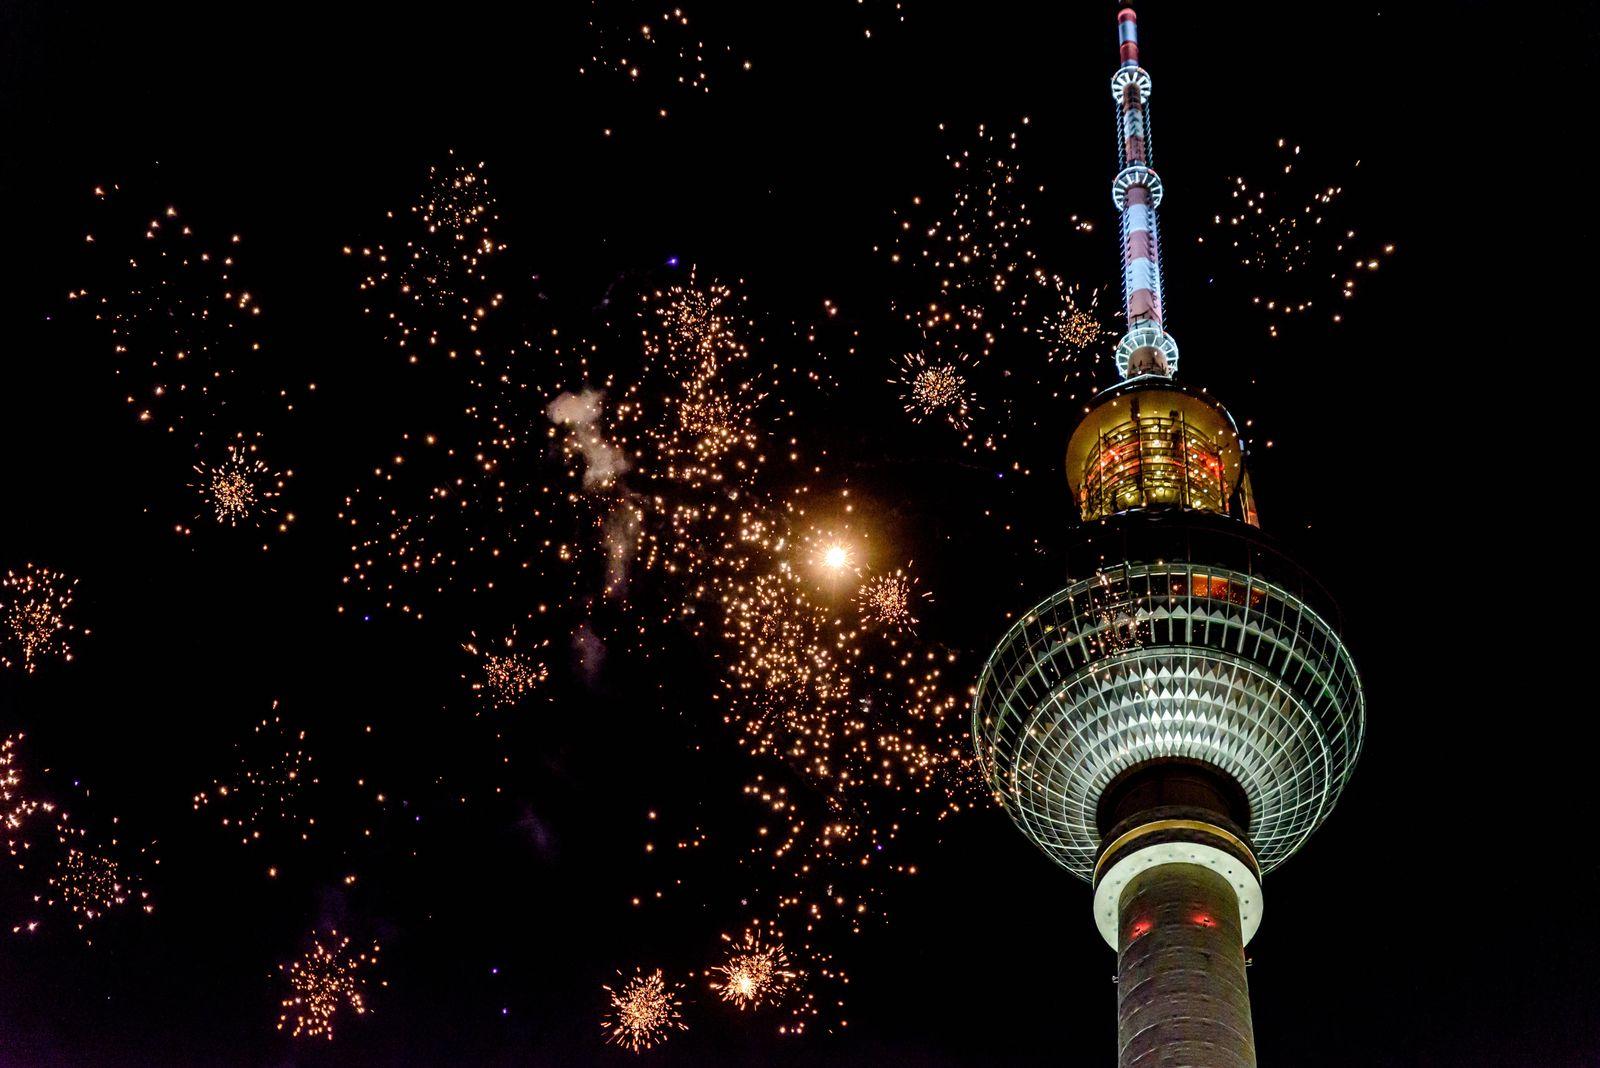 Feuerwerk vor dem Berliner Fernsehturm. / Fireworks in front of the Berlin TV tower. snapshot-photography/F.Boillot ***